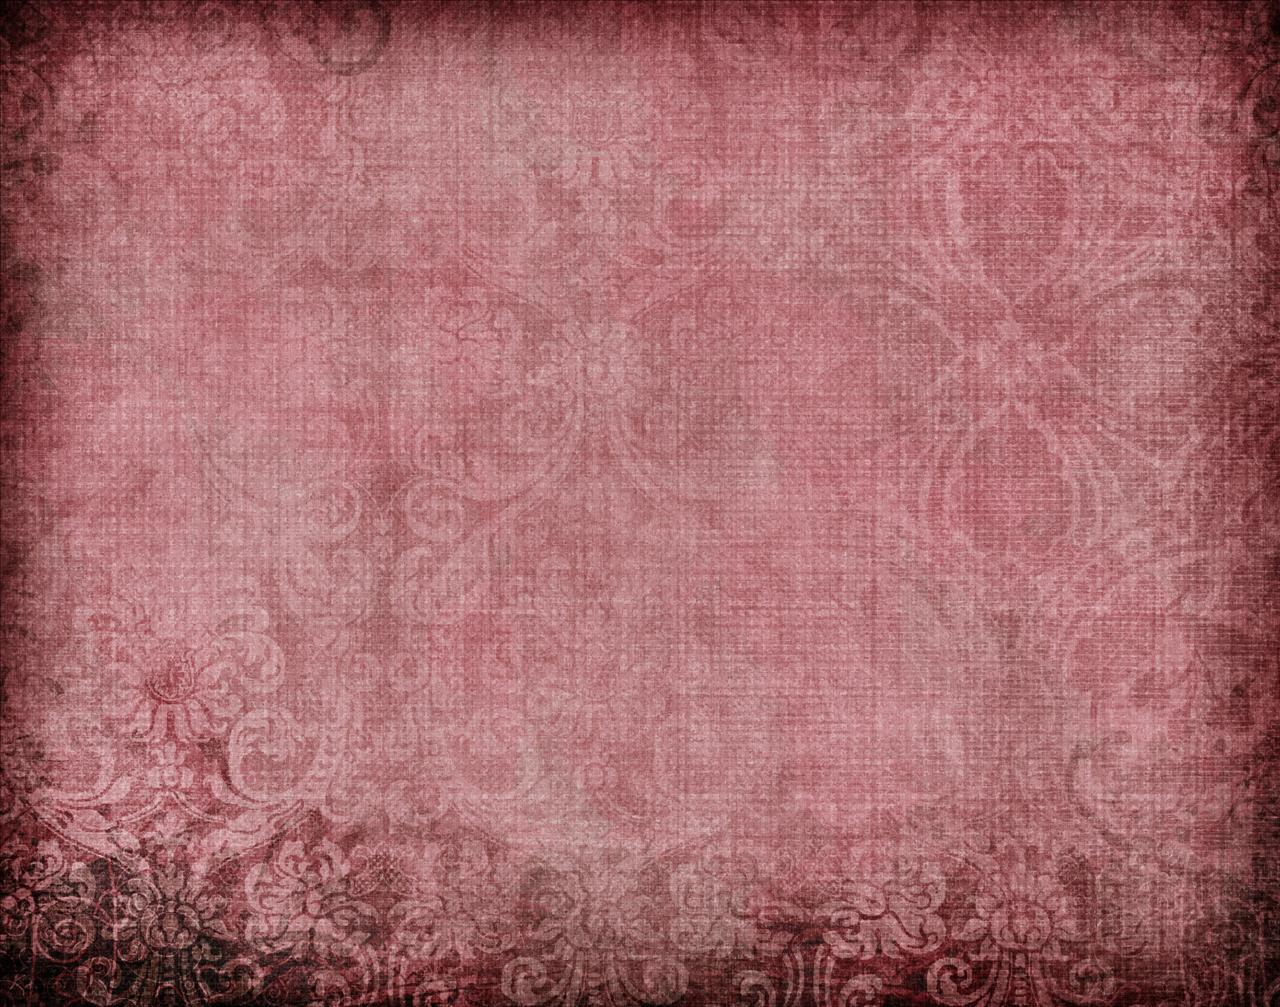 47 Lace Wallpaper Background On Wallpapersafari